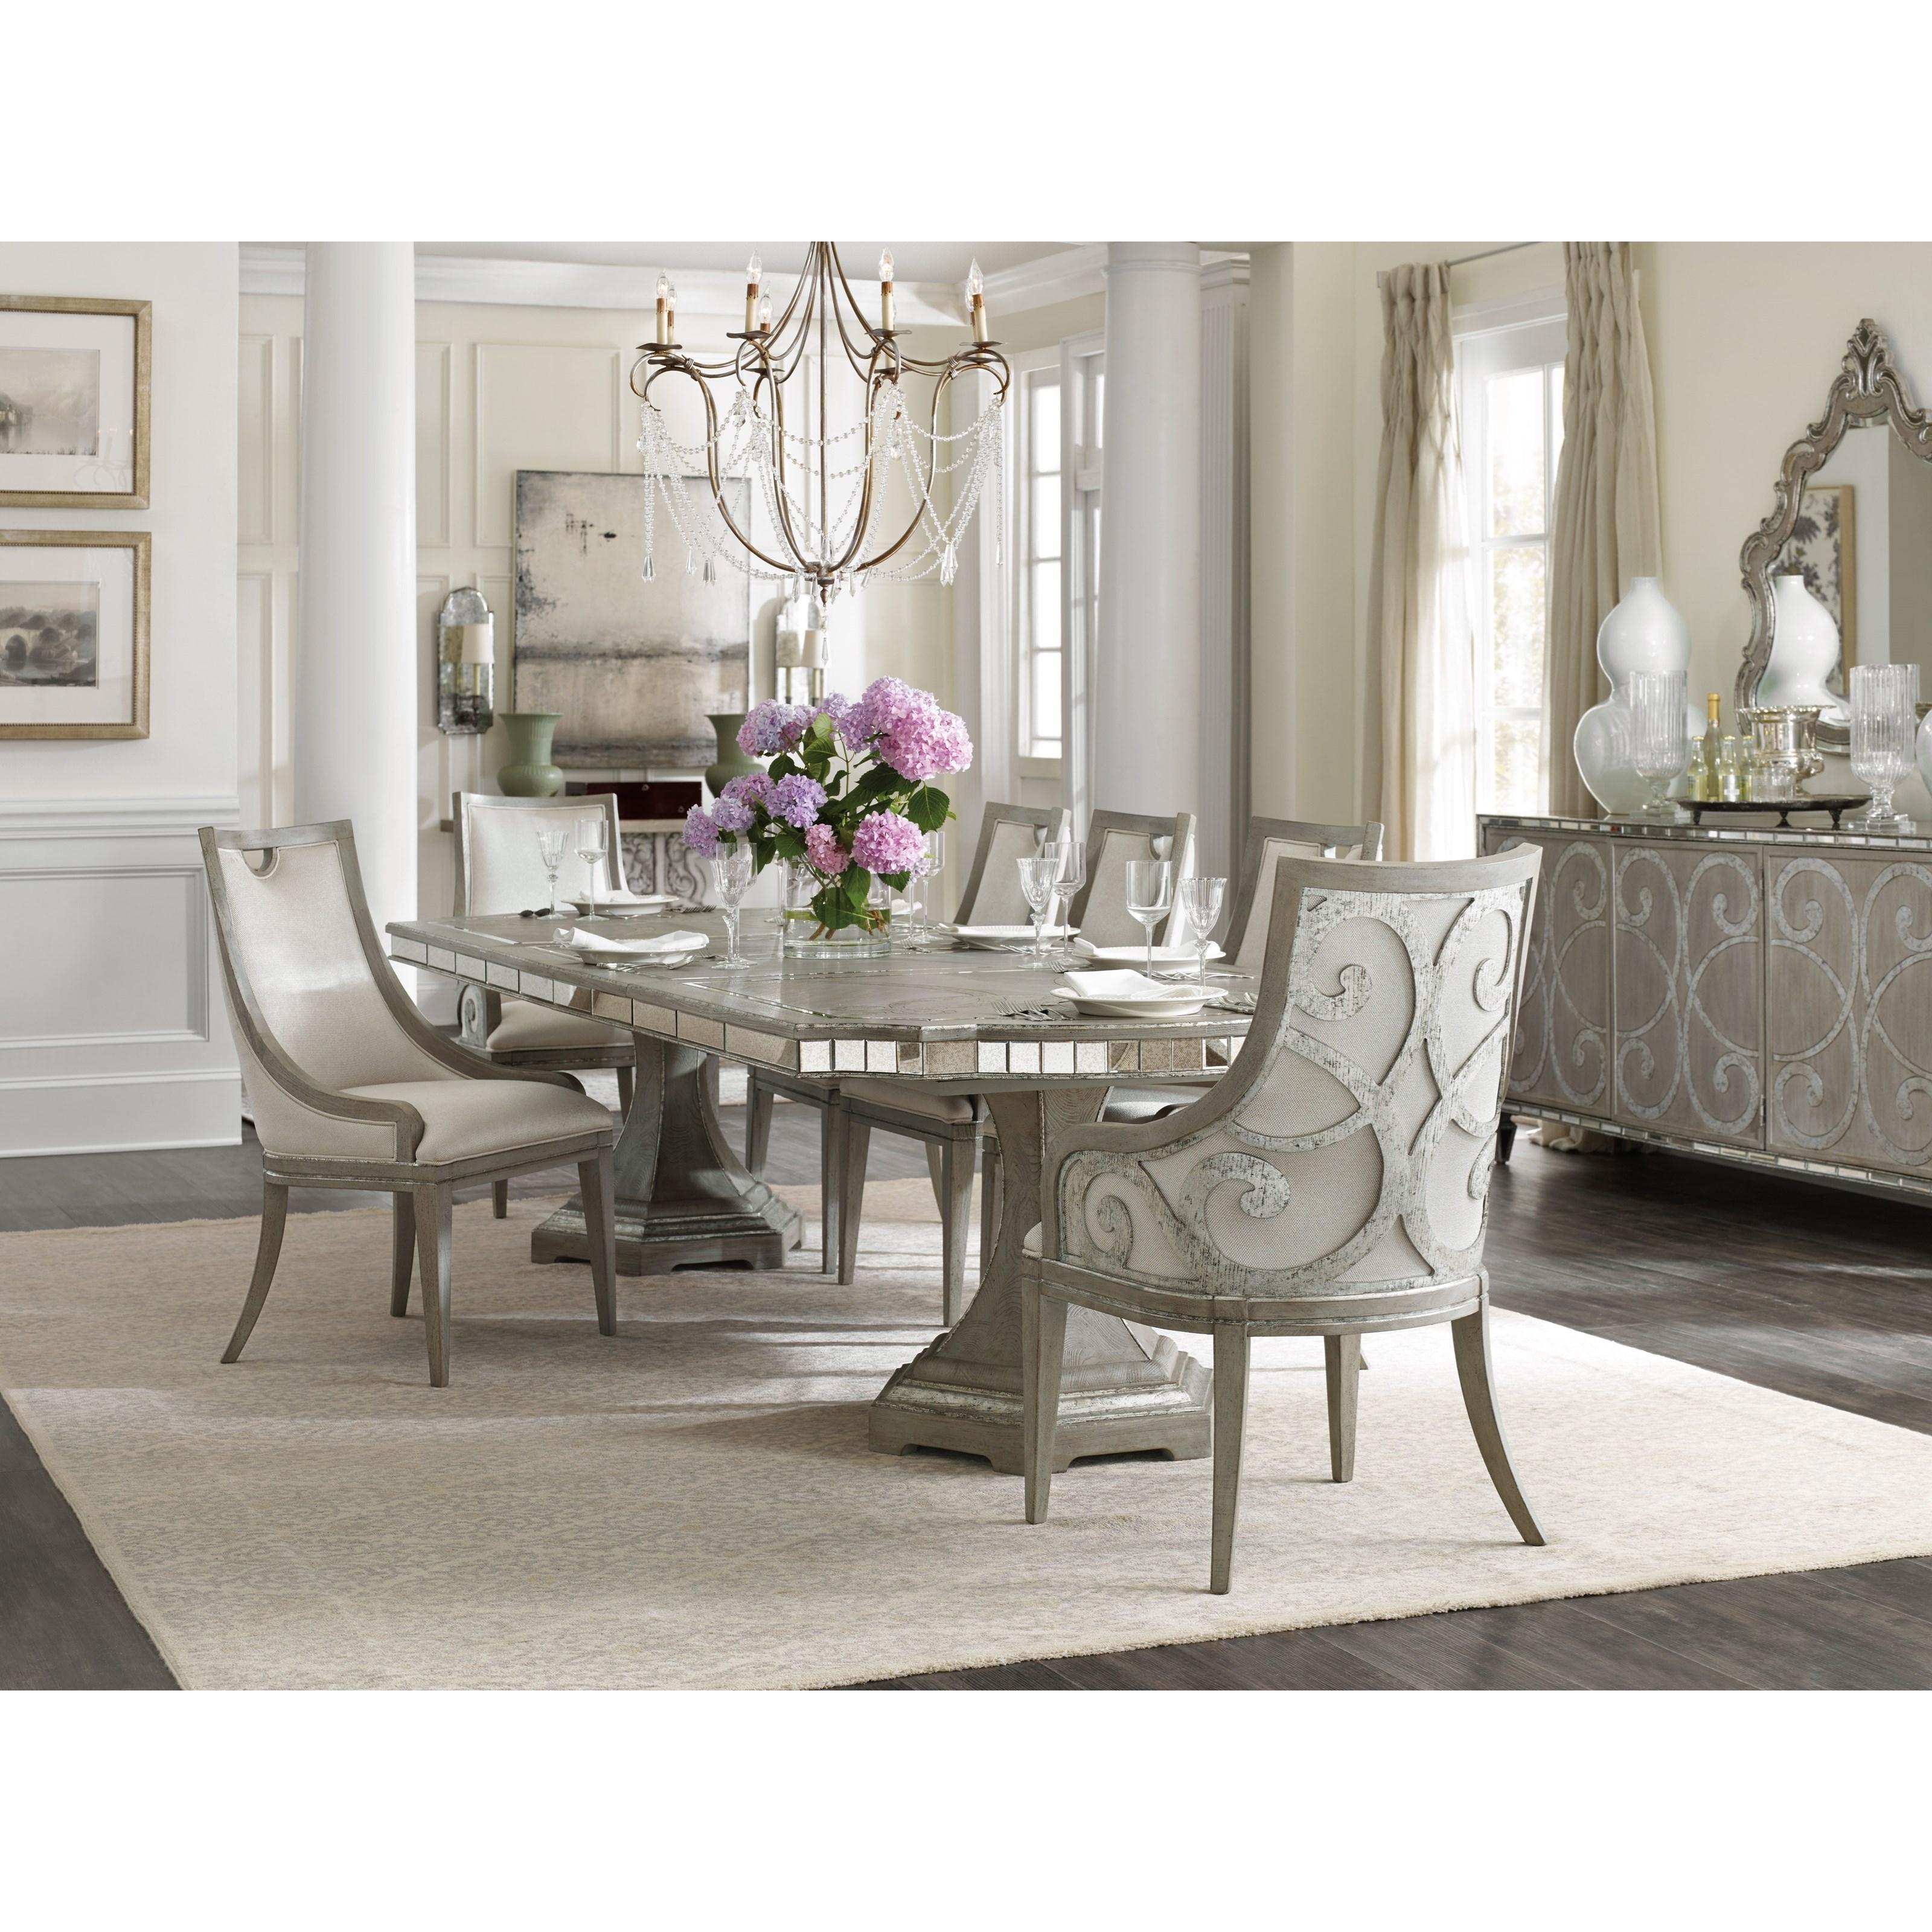 Hooker Furniture Sanctuary Formal Dining Room Group